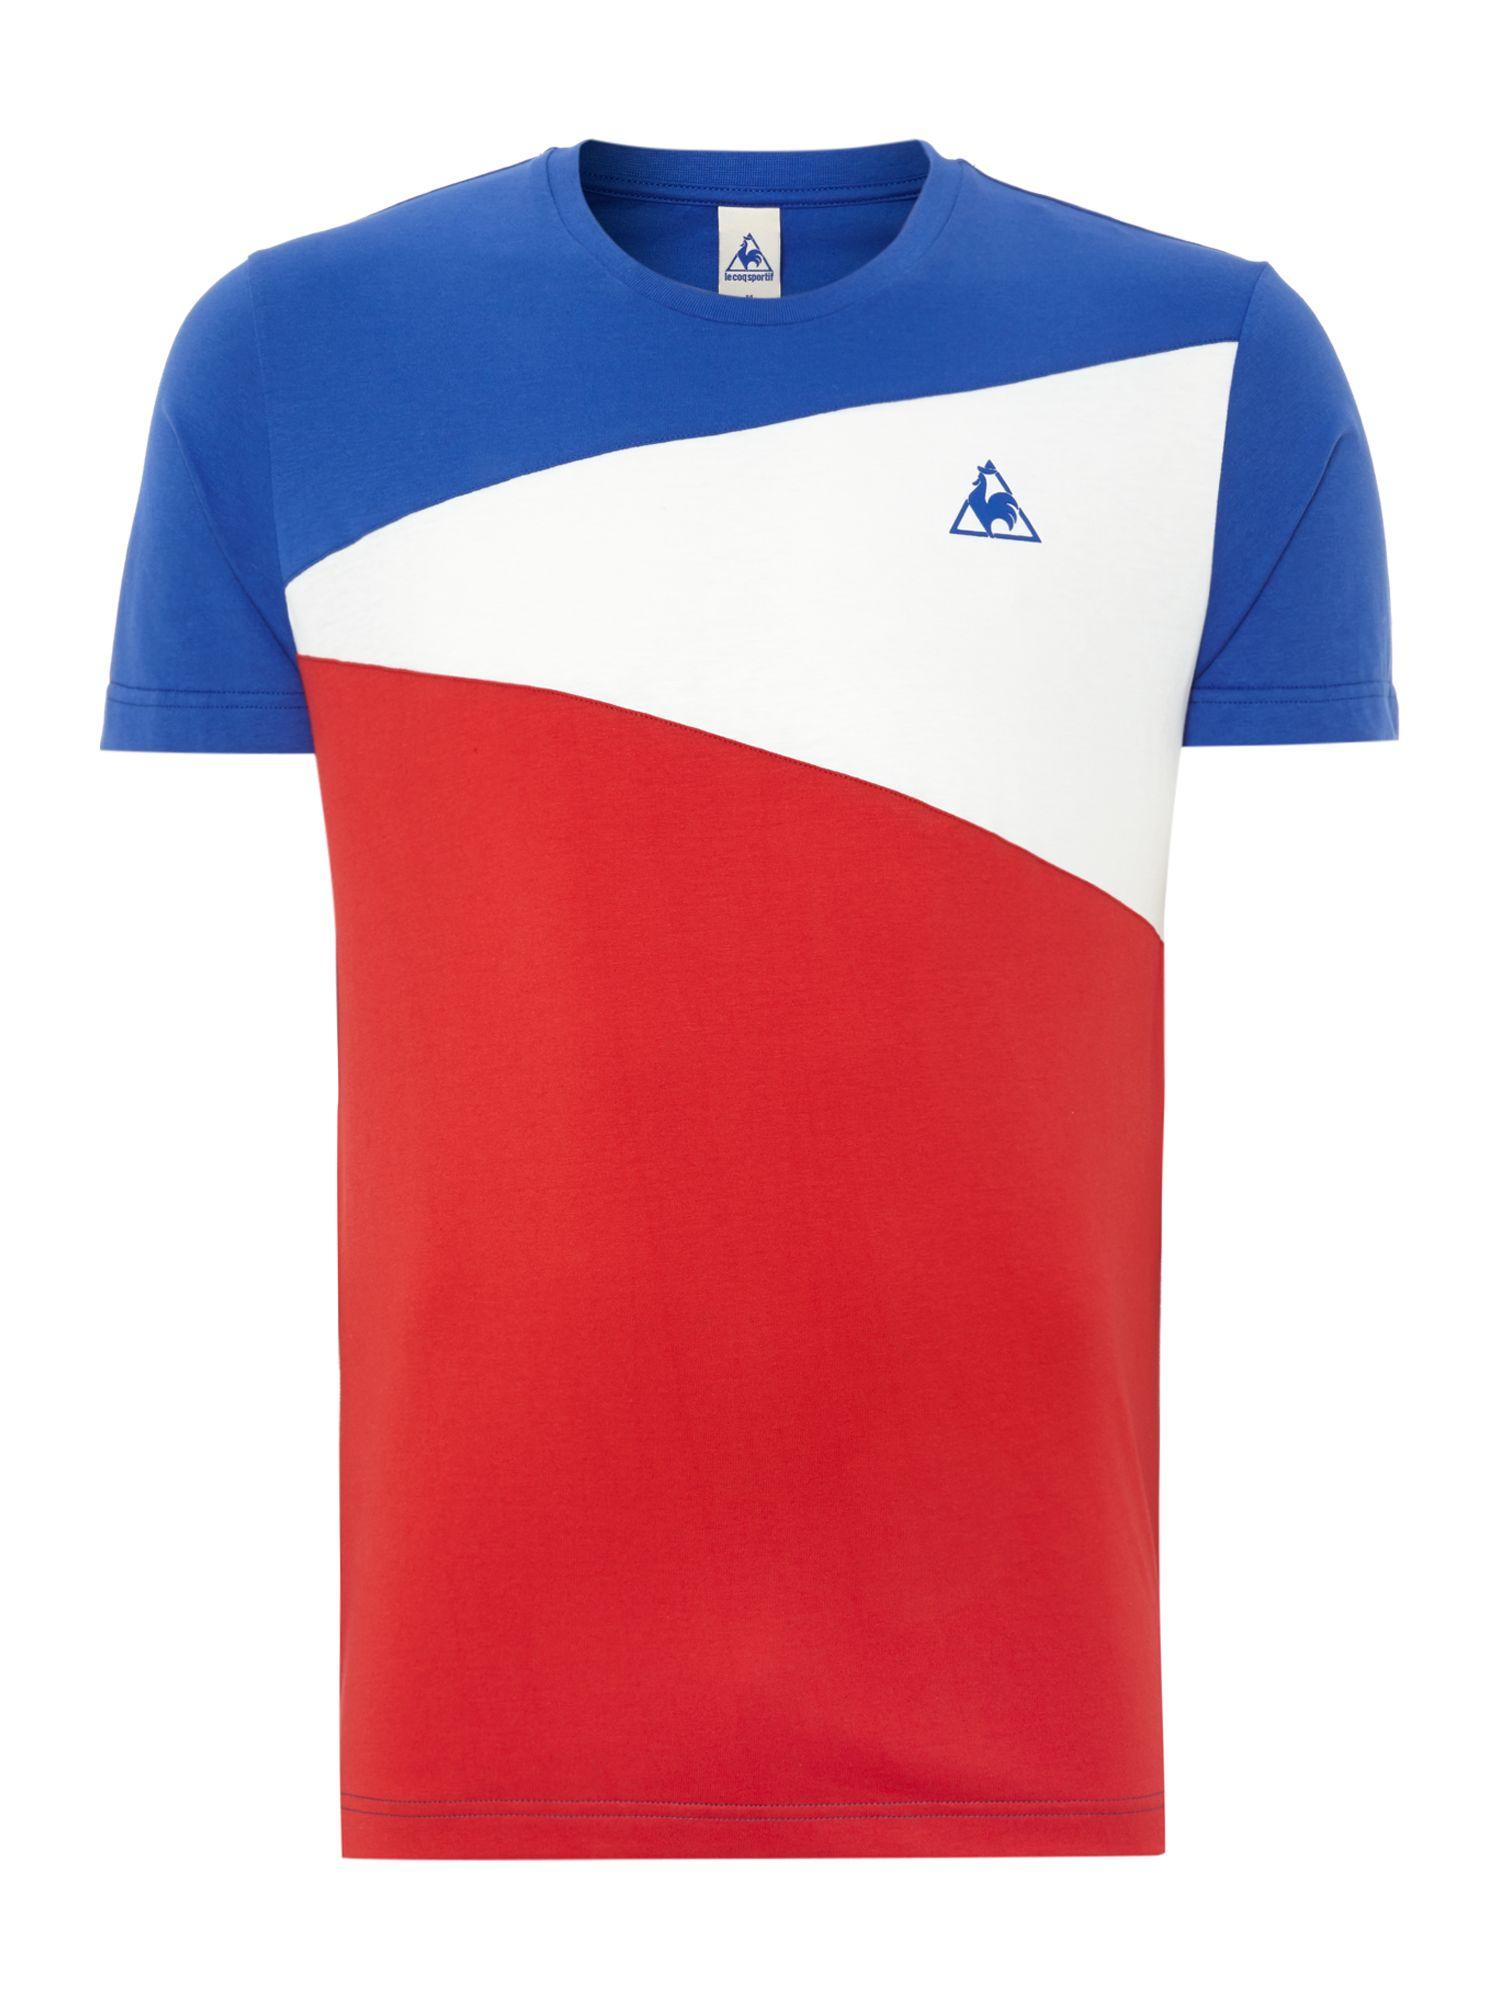 le coq sportif shirt - photo #16